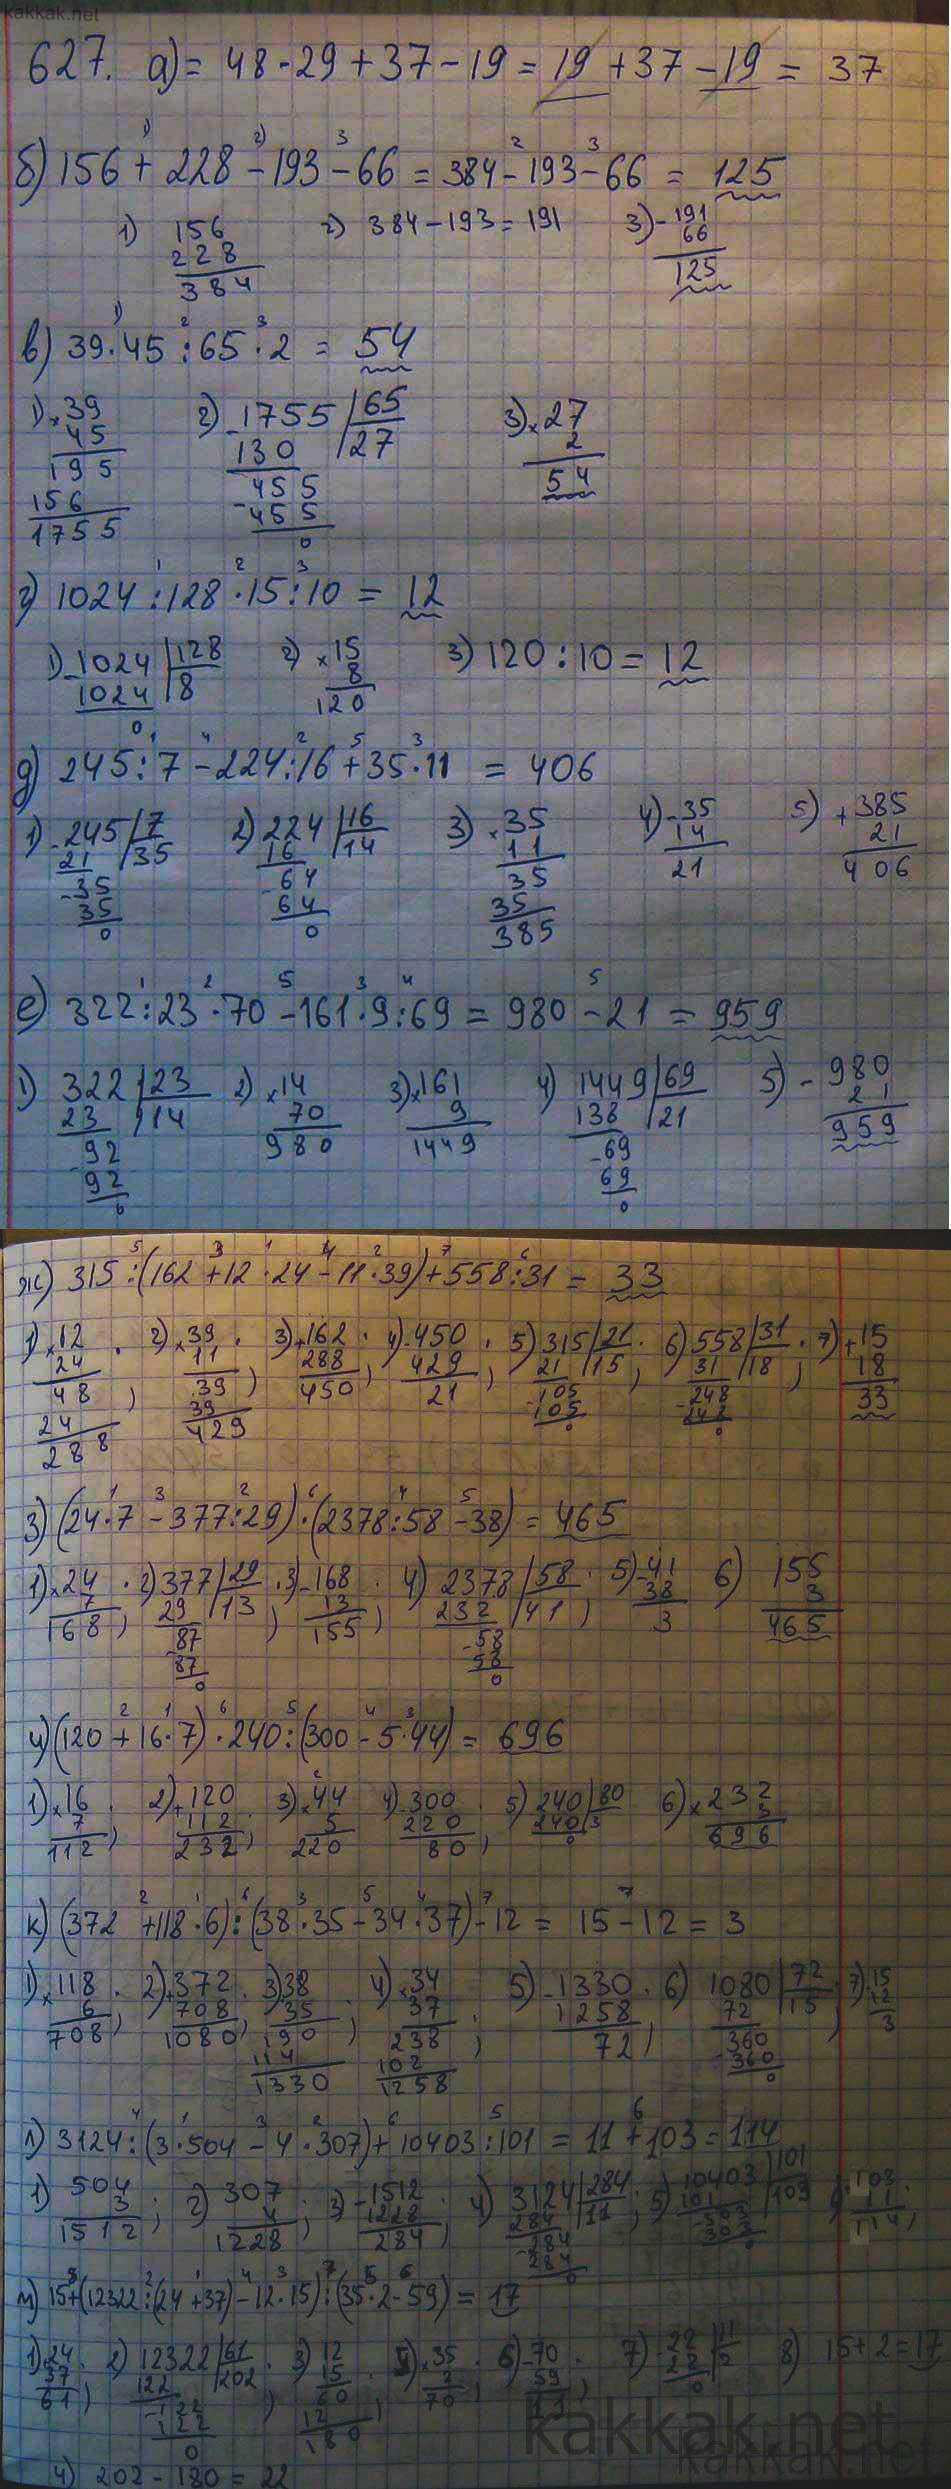 Гдз по математике 5класс виленкин мнемозина 2018 года